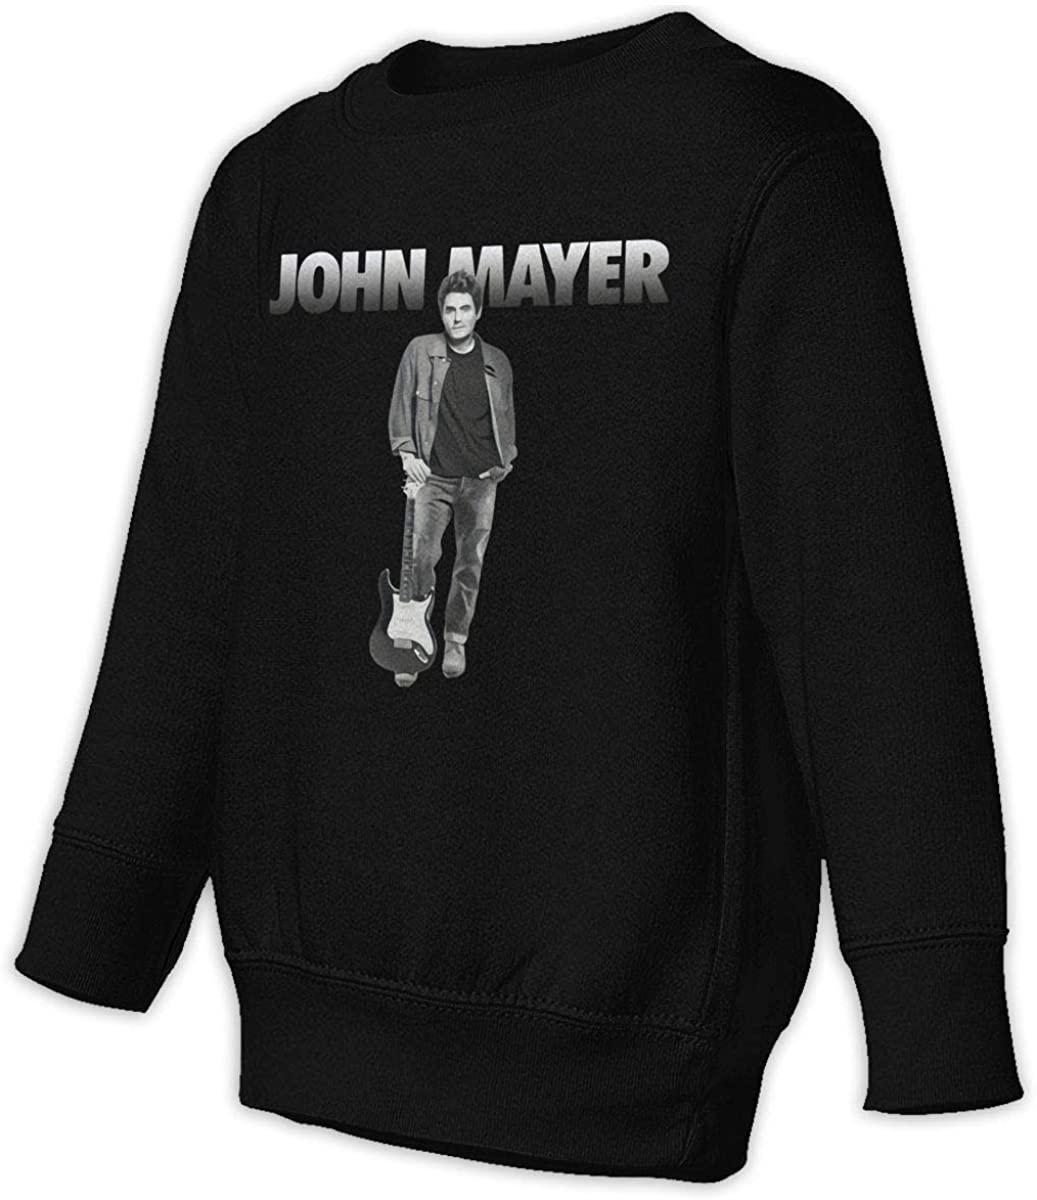 John Mayer Tour 2019 Unisex Sweatshirt Youth Boy and Girls Pullover Sweatshirt Black